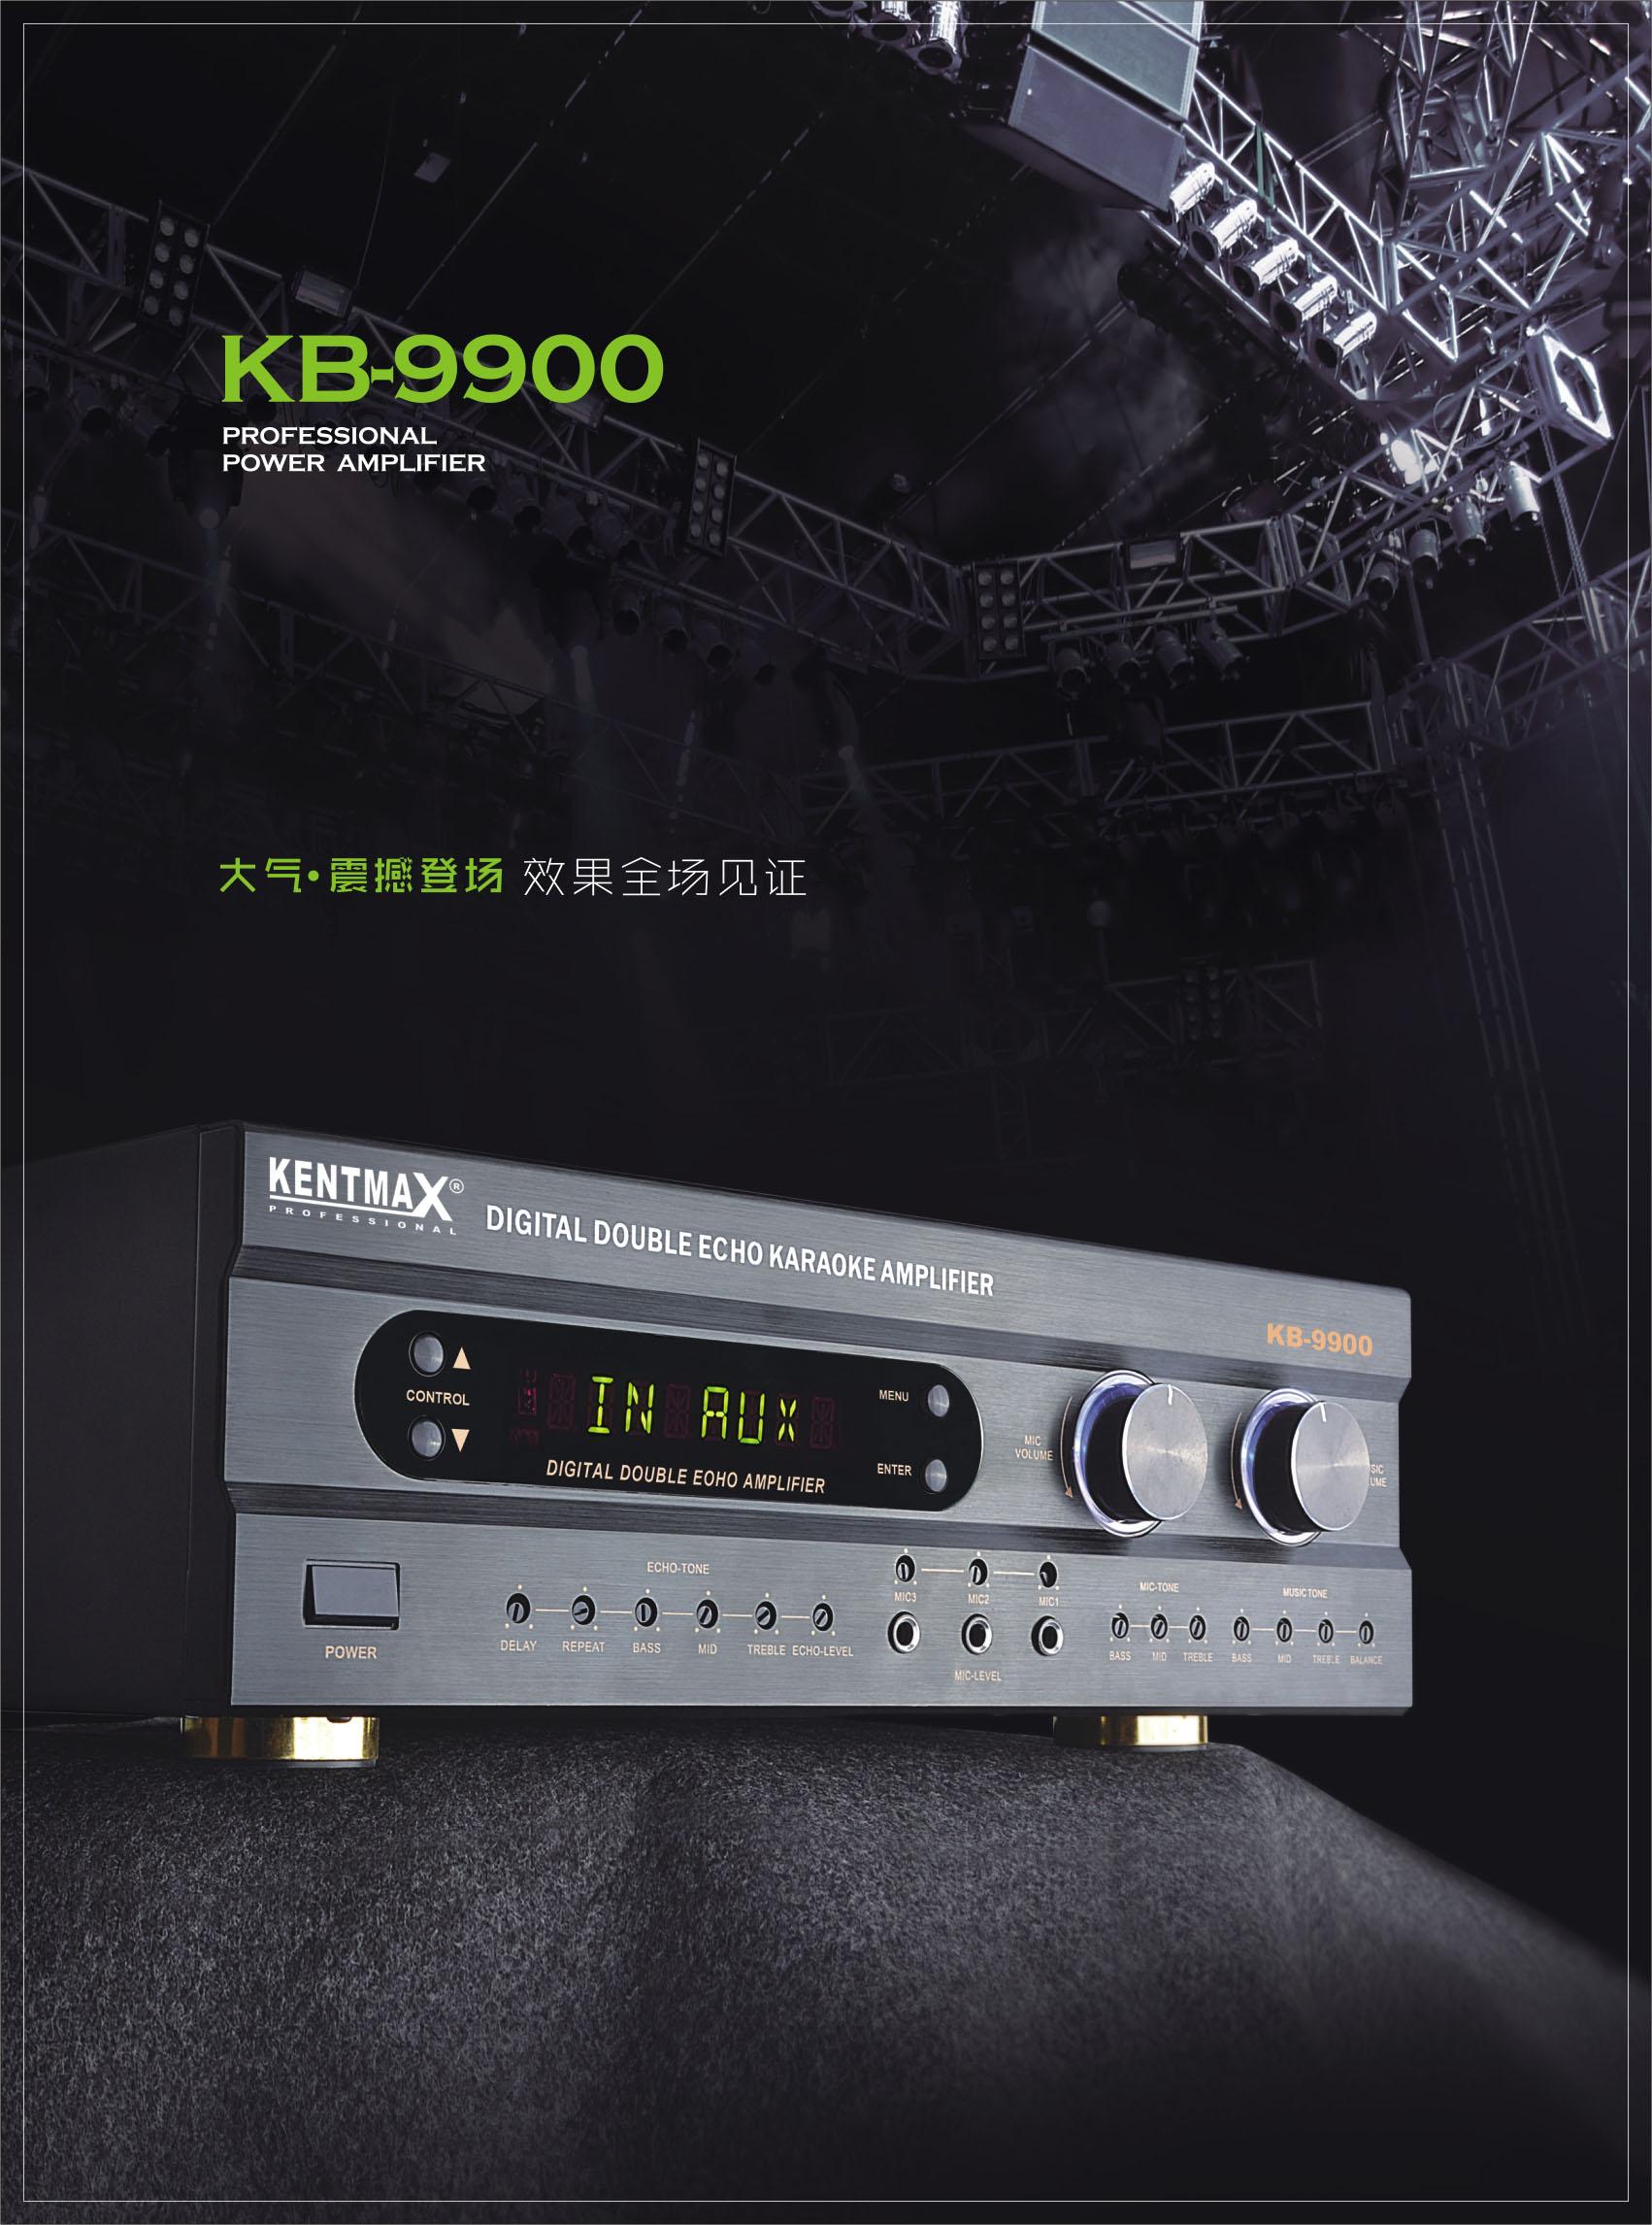 Karaoke amplifiers E-catalogue - Kentmax